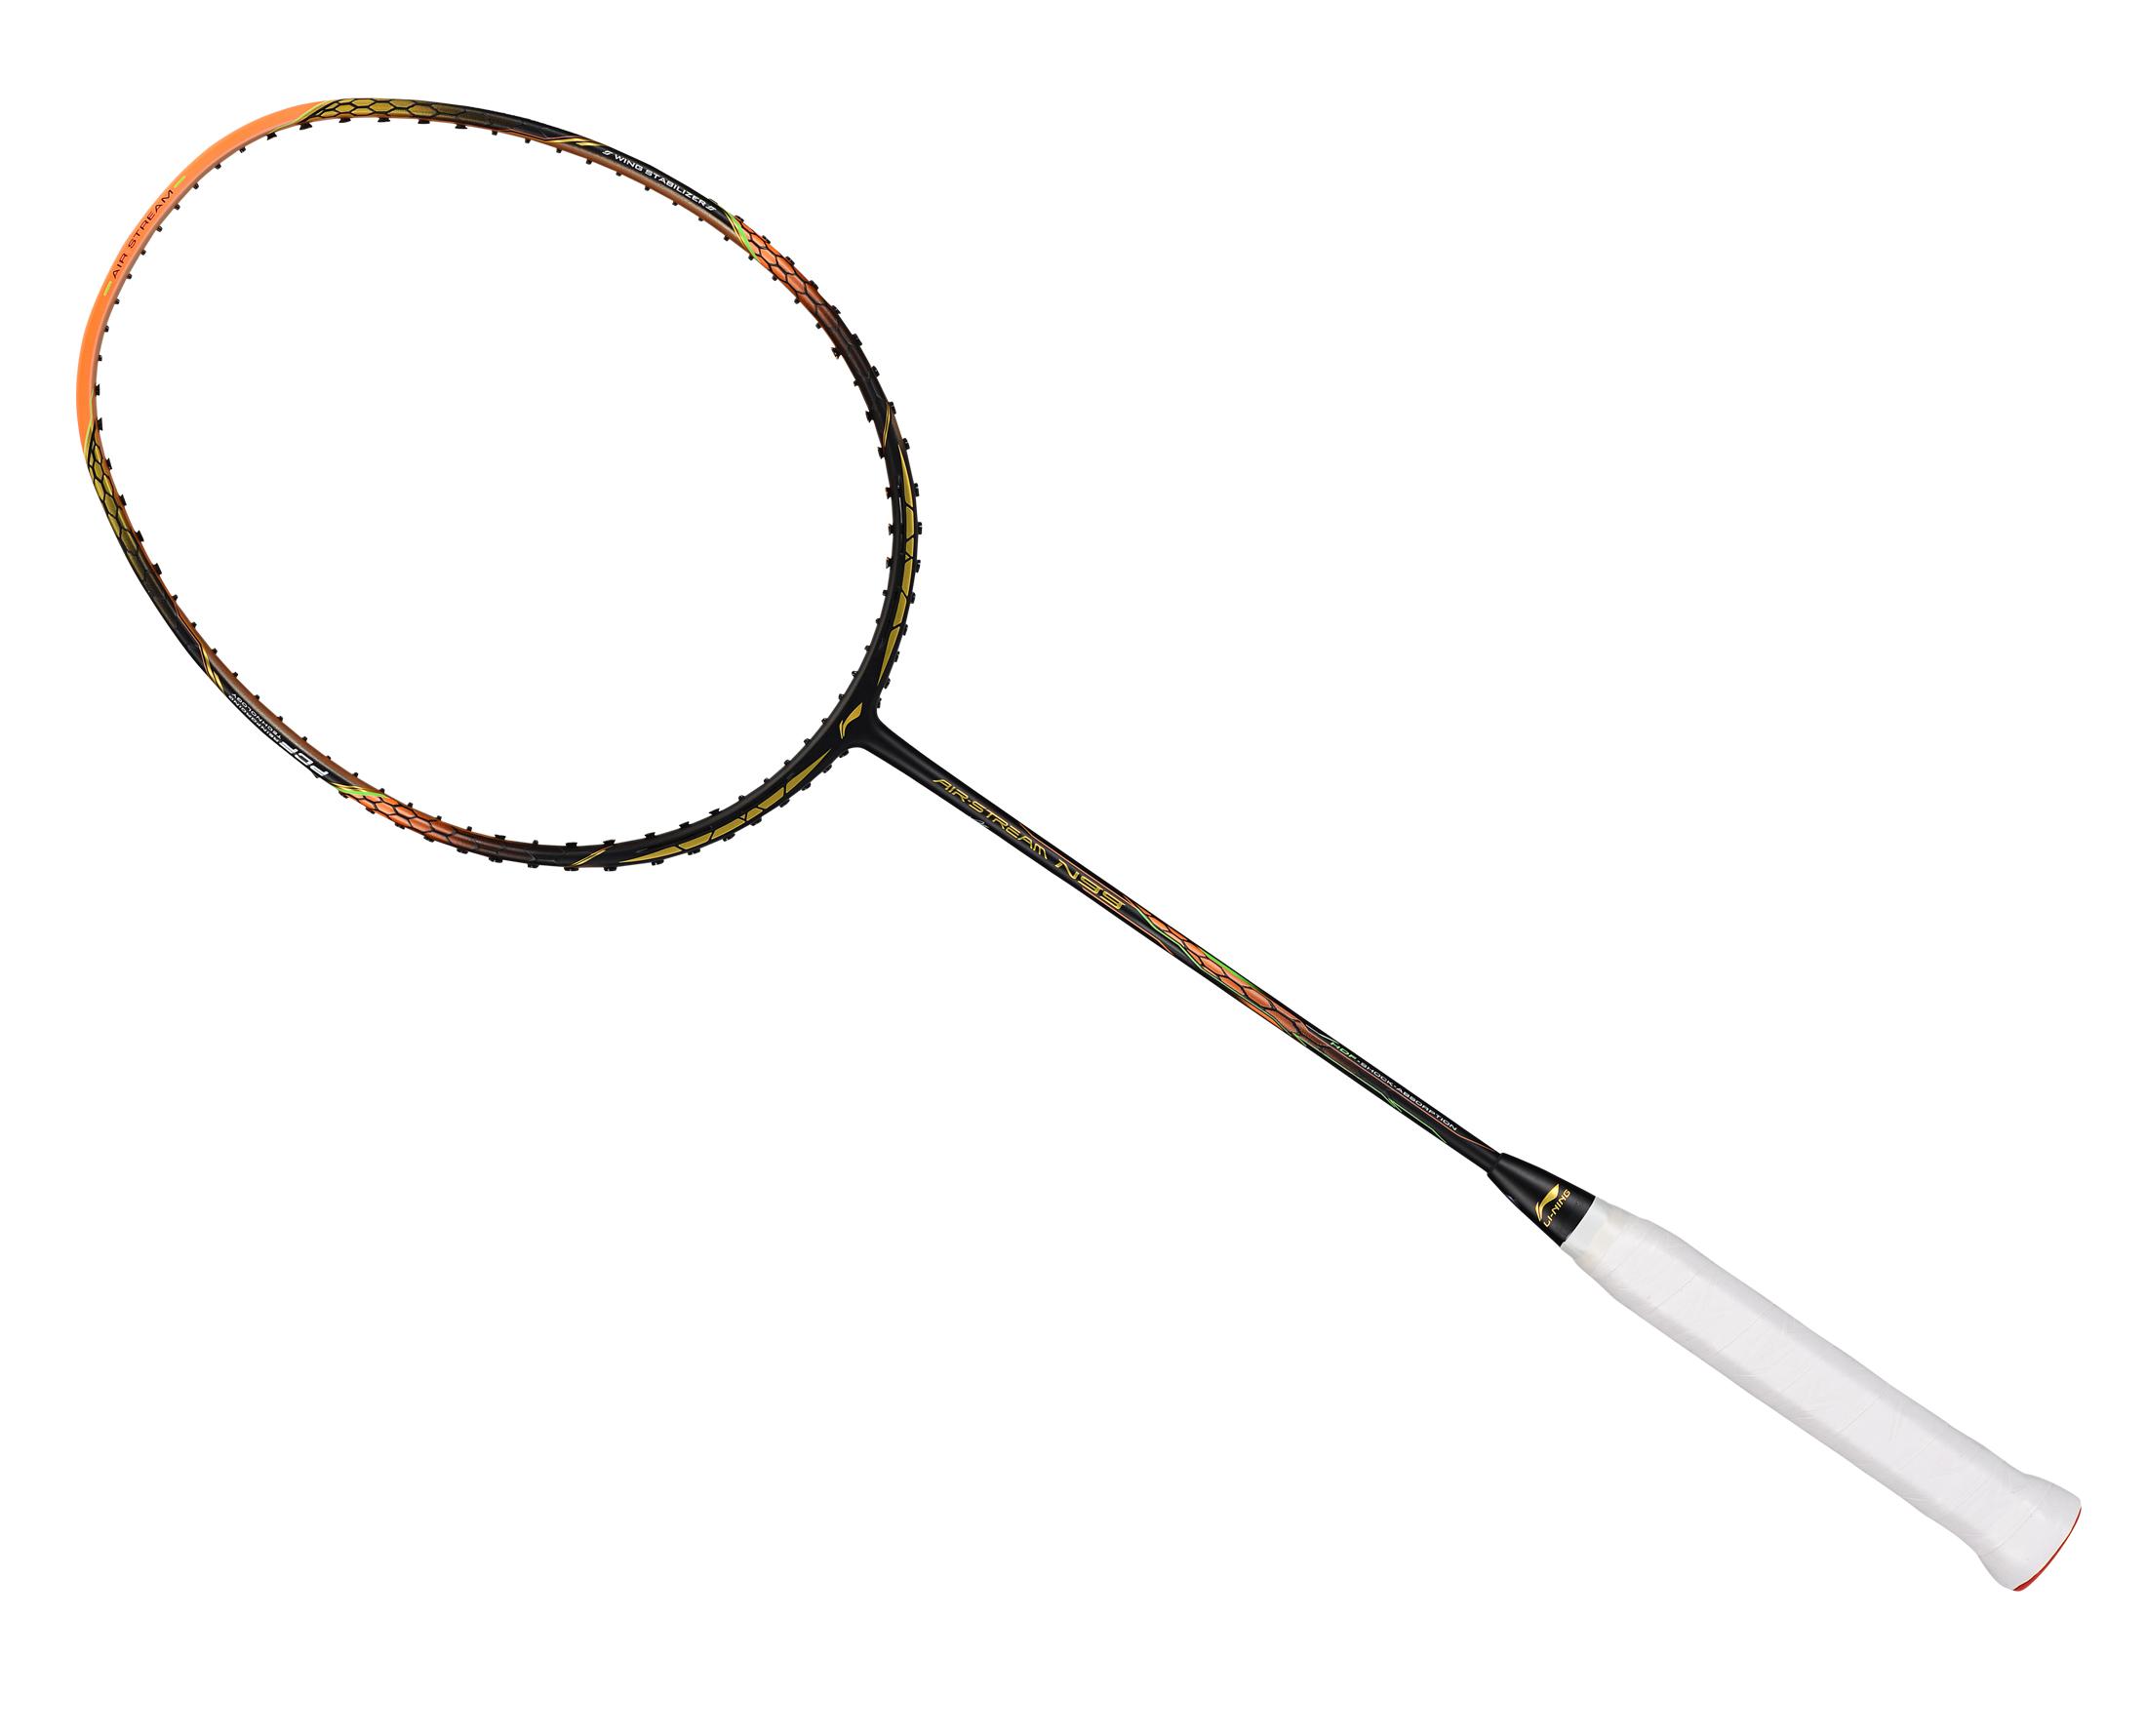 Badminton shop online usa